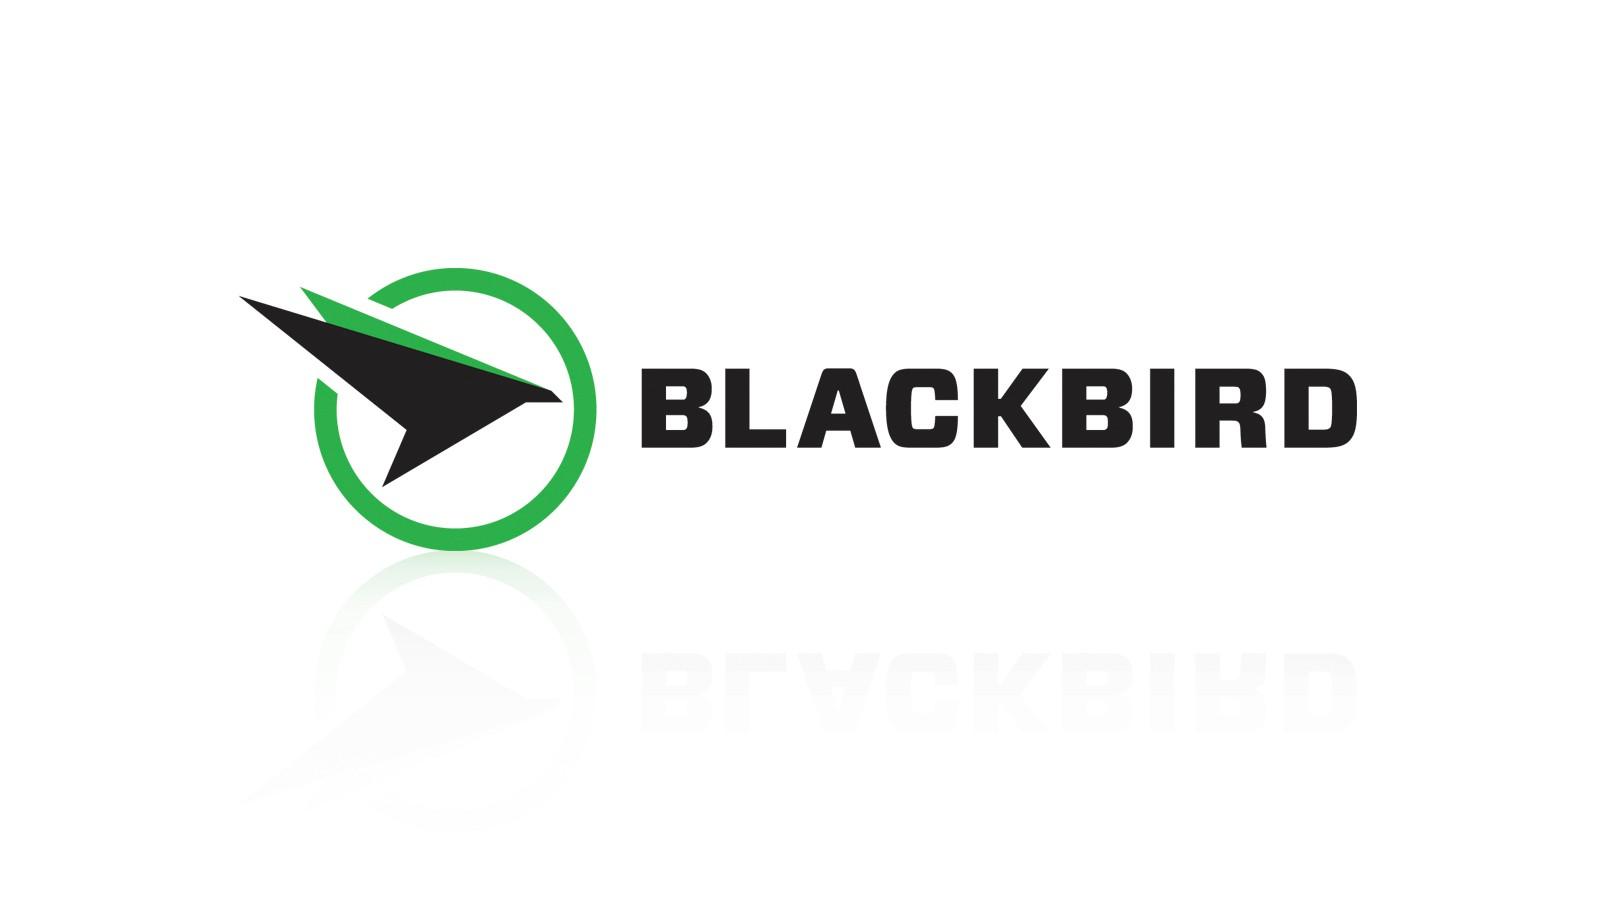 TCI BLACKBIRD NEXTGEN LOGO